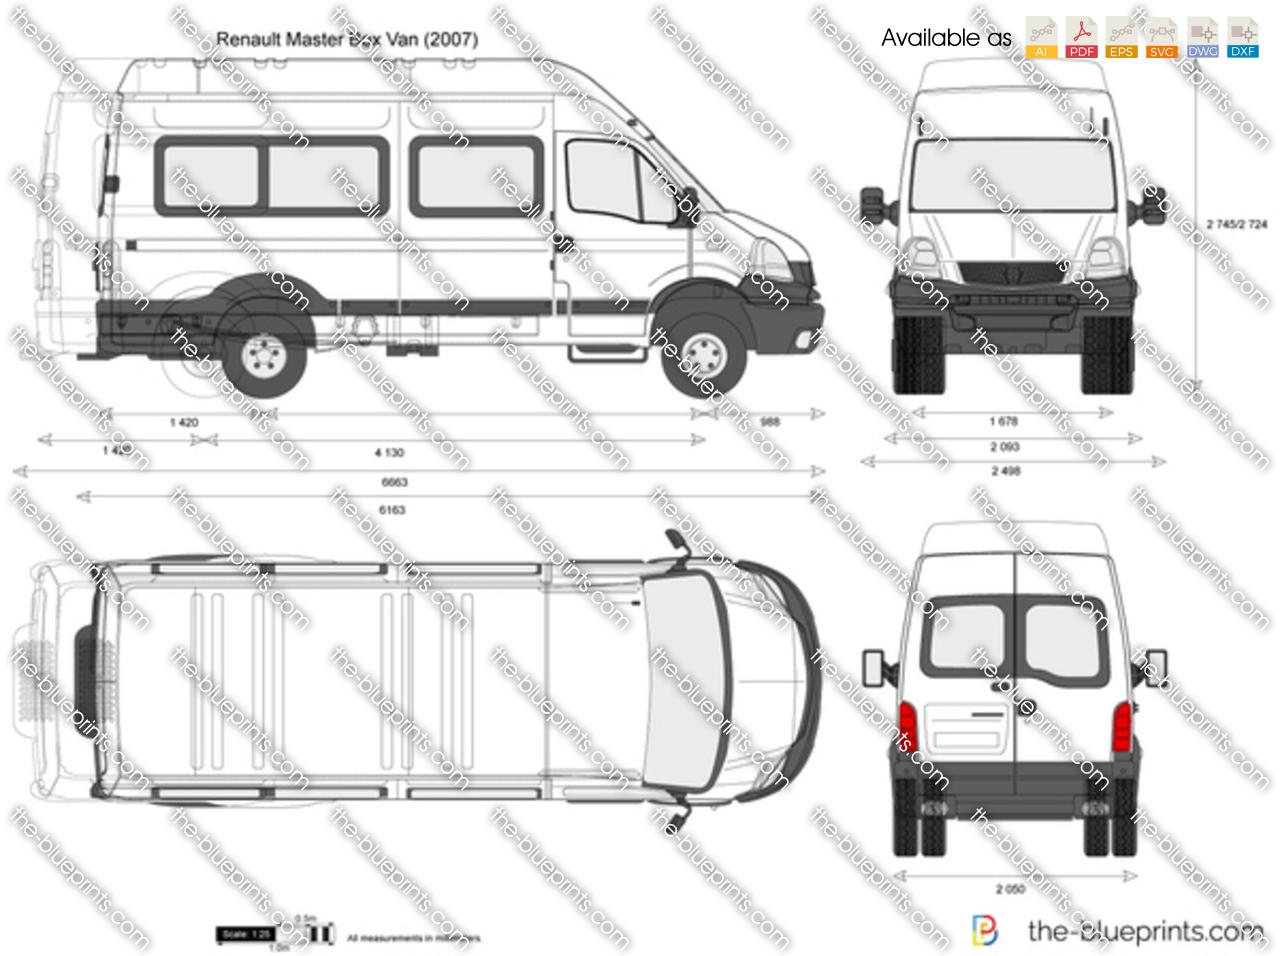 Renault Master Box Van 2006